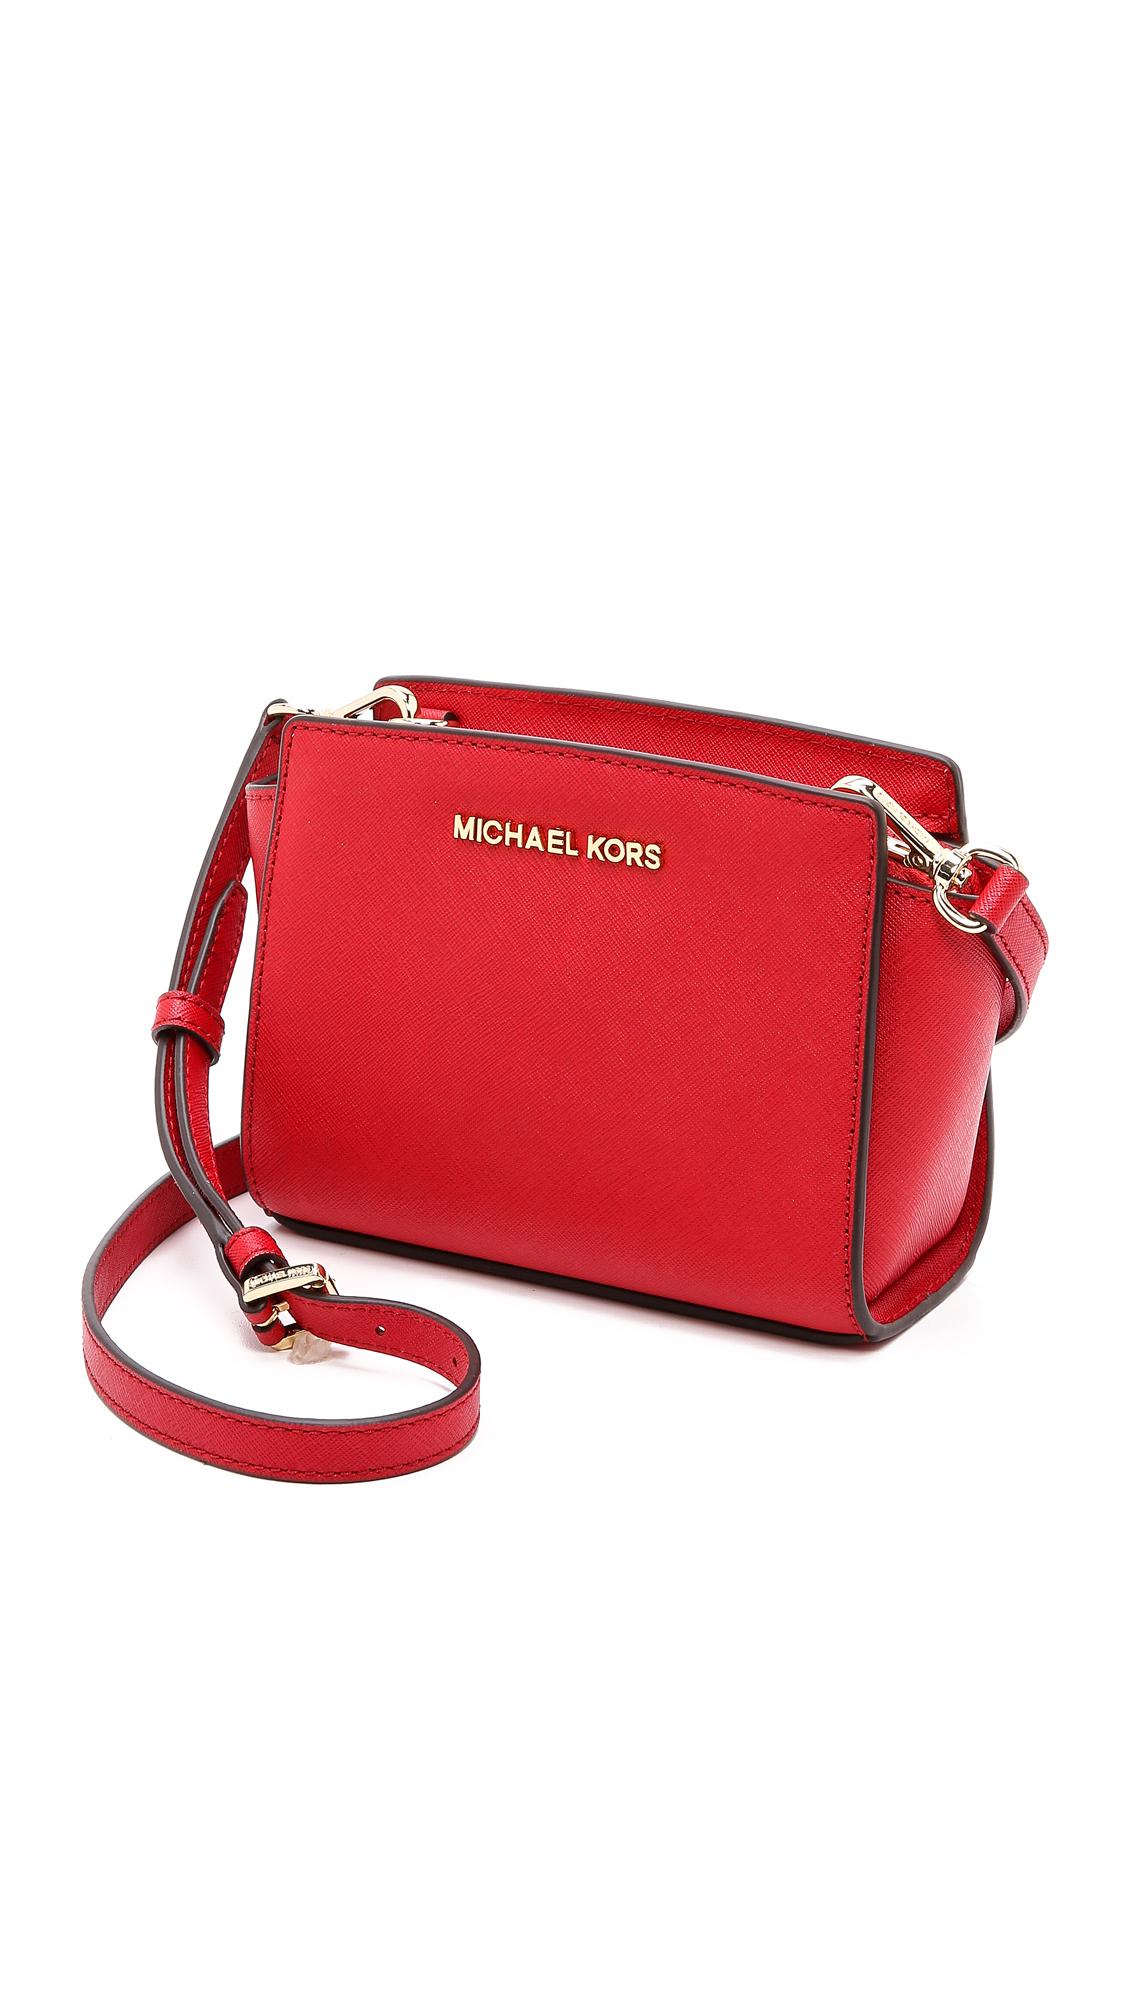 069b2b4f90e53 ... purchase michael michael kors selma mini messenger bag pale pink in red  lyst 3cc33 9561b